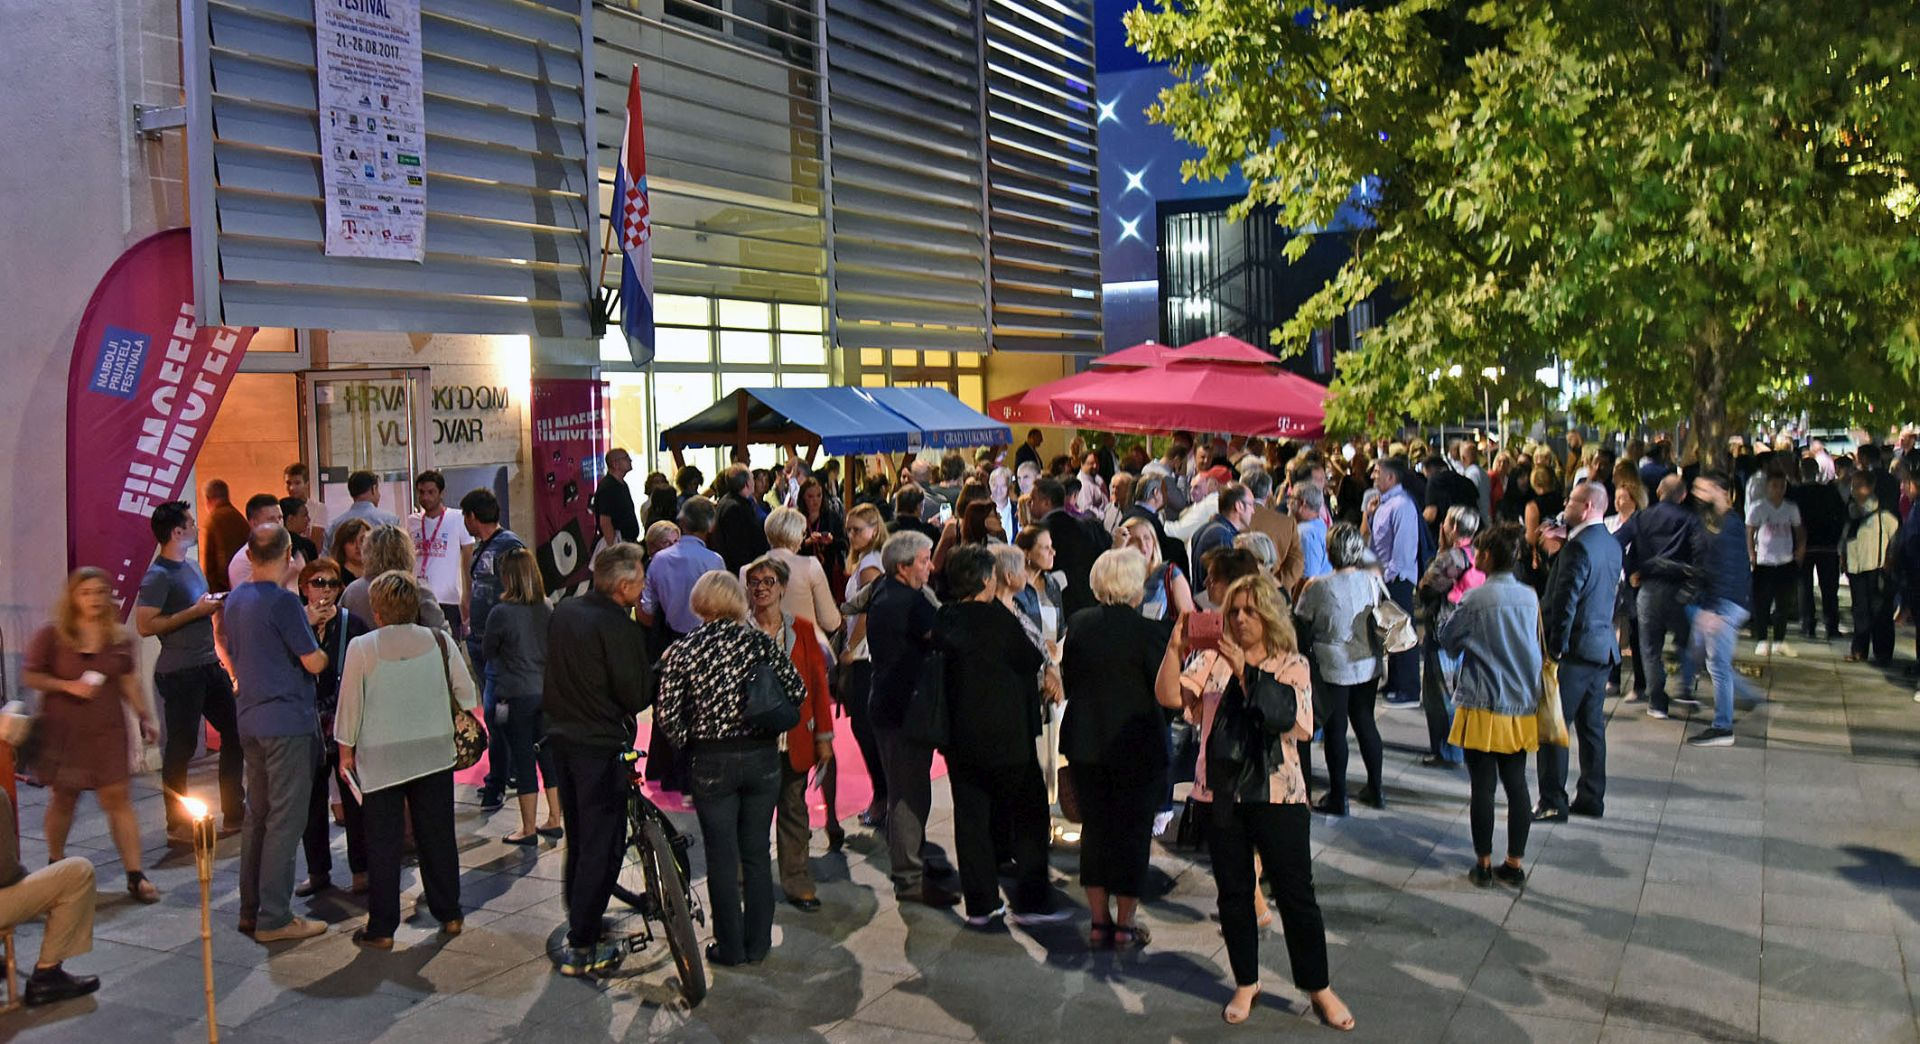 Svečano otvoren 11. Vukovar film festival